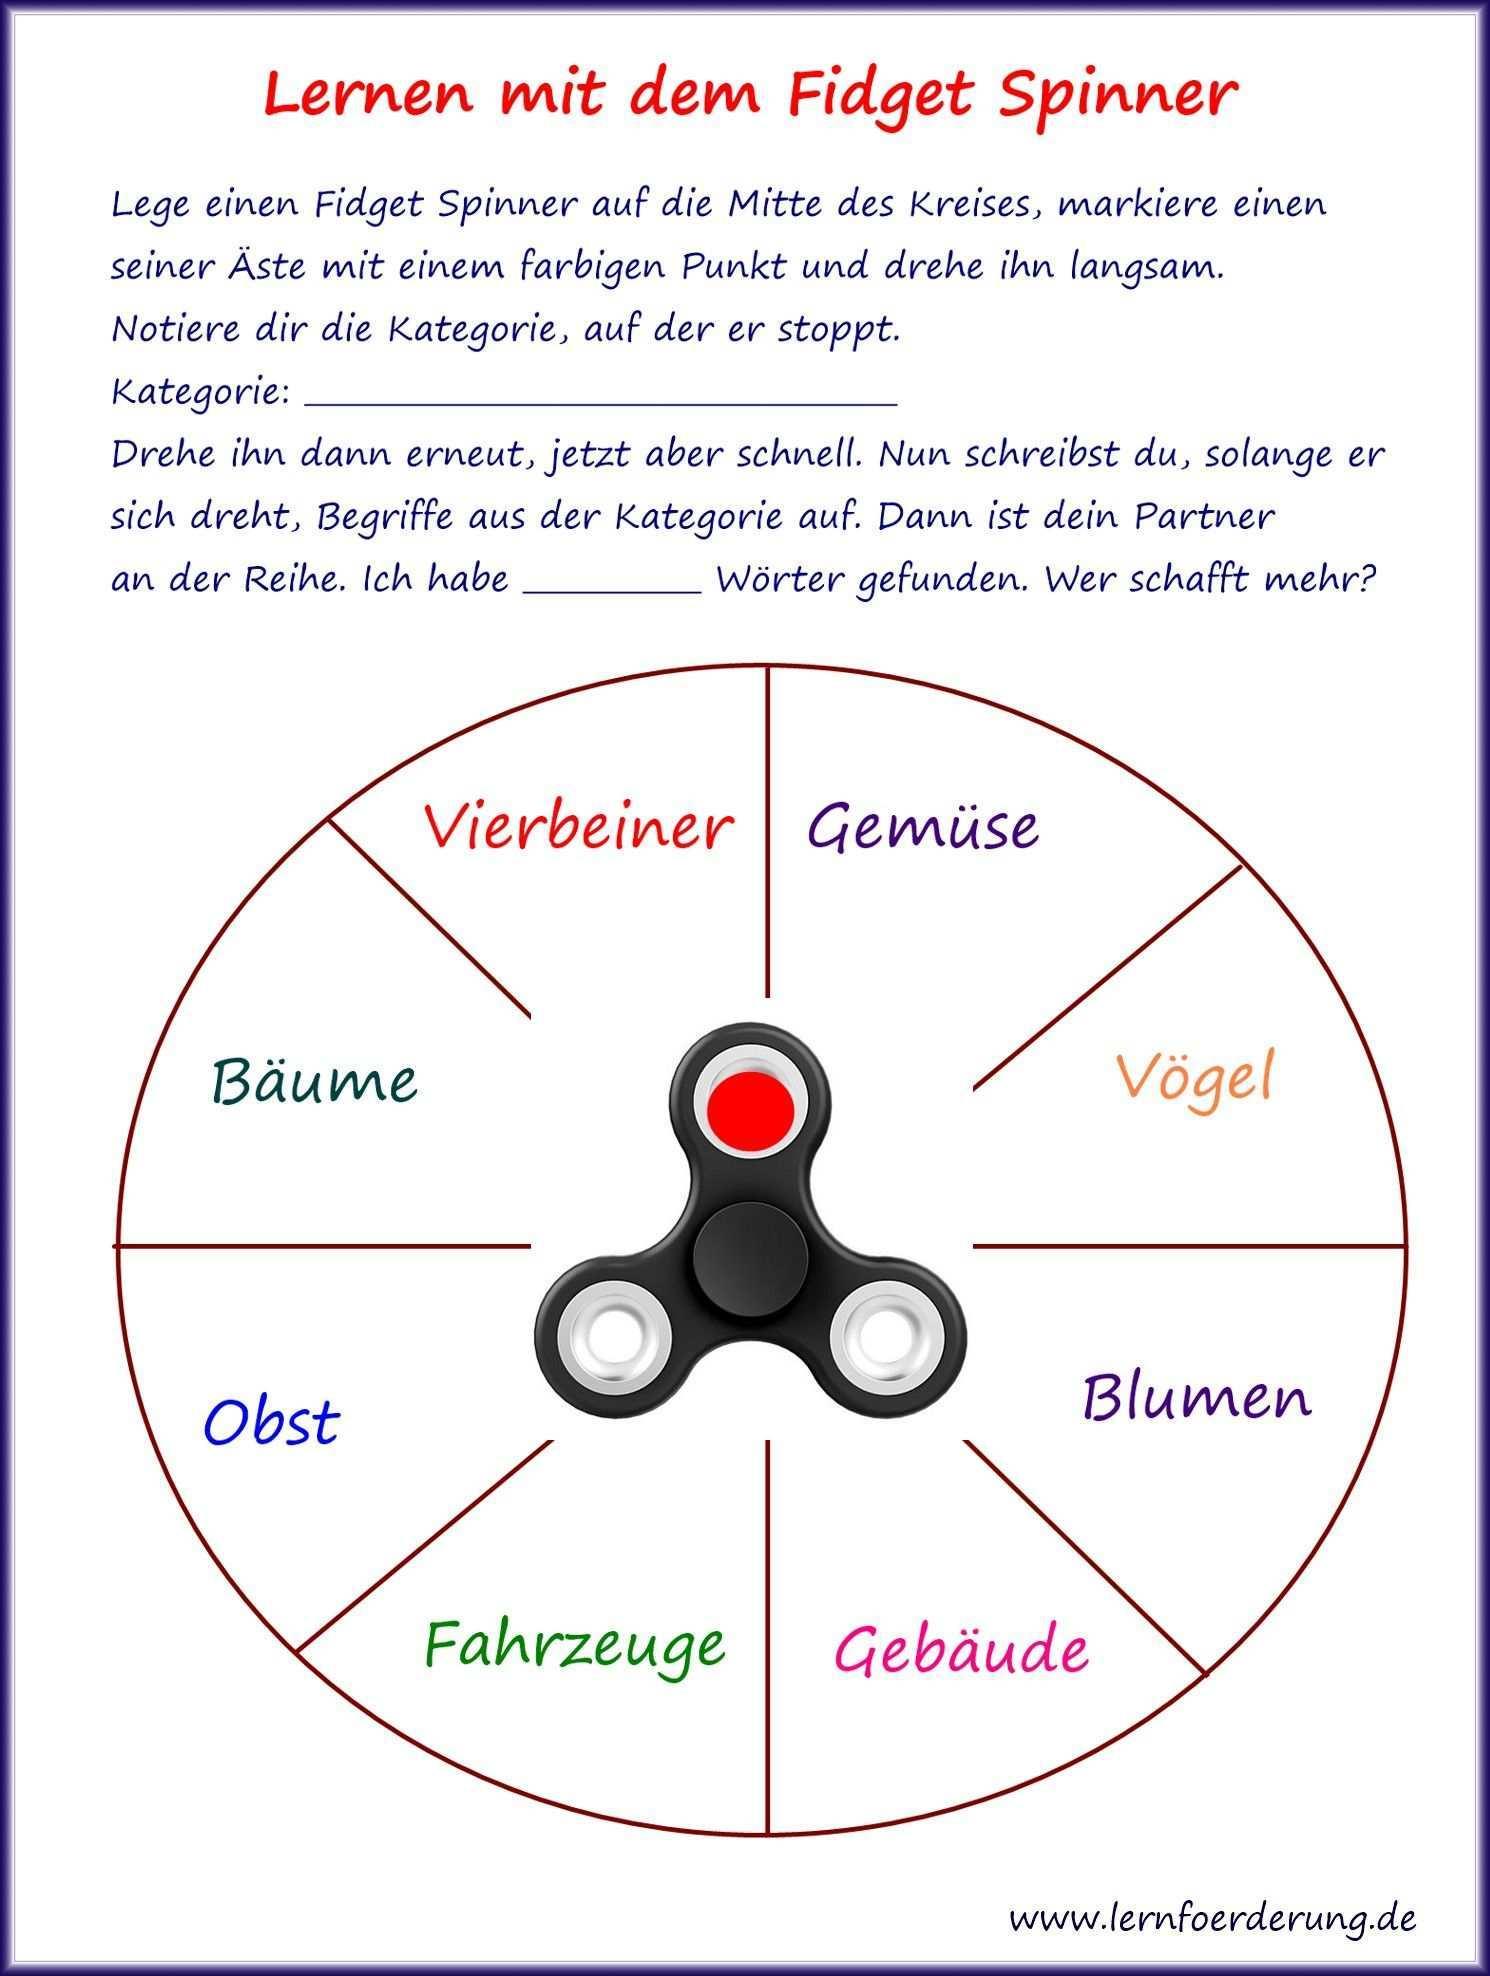 Fidget Hand Spinner Motivierende Ubung Mit Dem Kinderspielzeug Nummer 1 Gut Furs Lernen Einmaleins Lernen Einmaleins Lernen